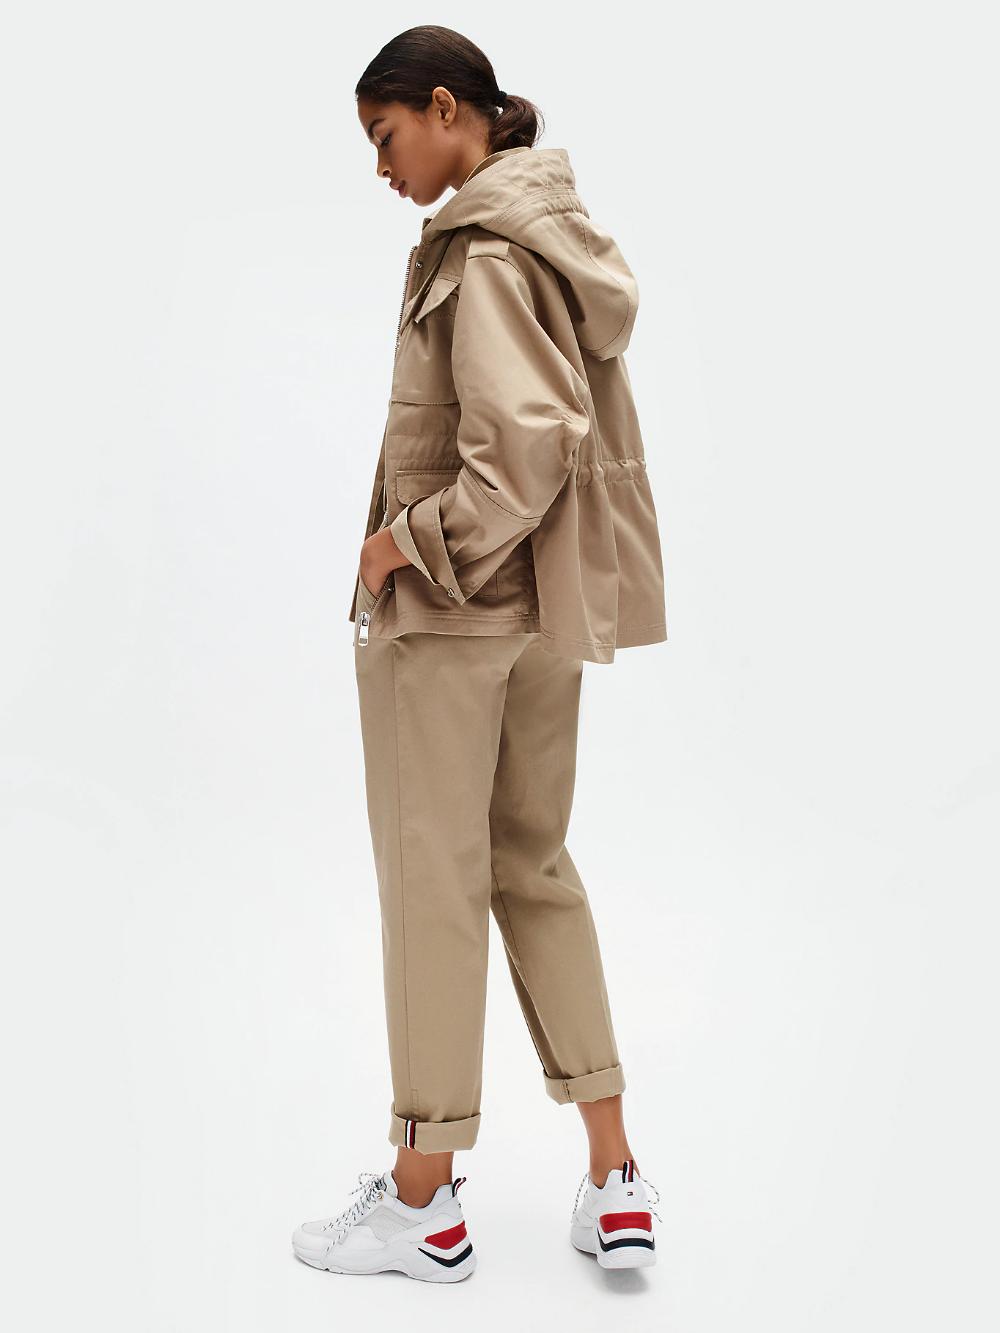 Cotton Twill Hooded Utility Jacket Beige Tommy Hilfiger Outerwear Jackets Women S Coats Jackets Tommy Hilfiger [ 1333 x 1000 Pixel ]